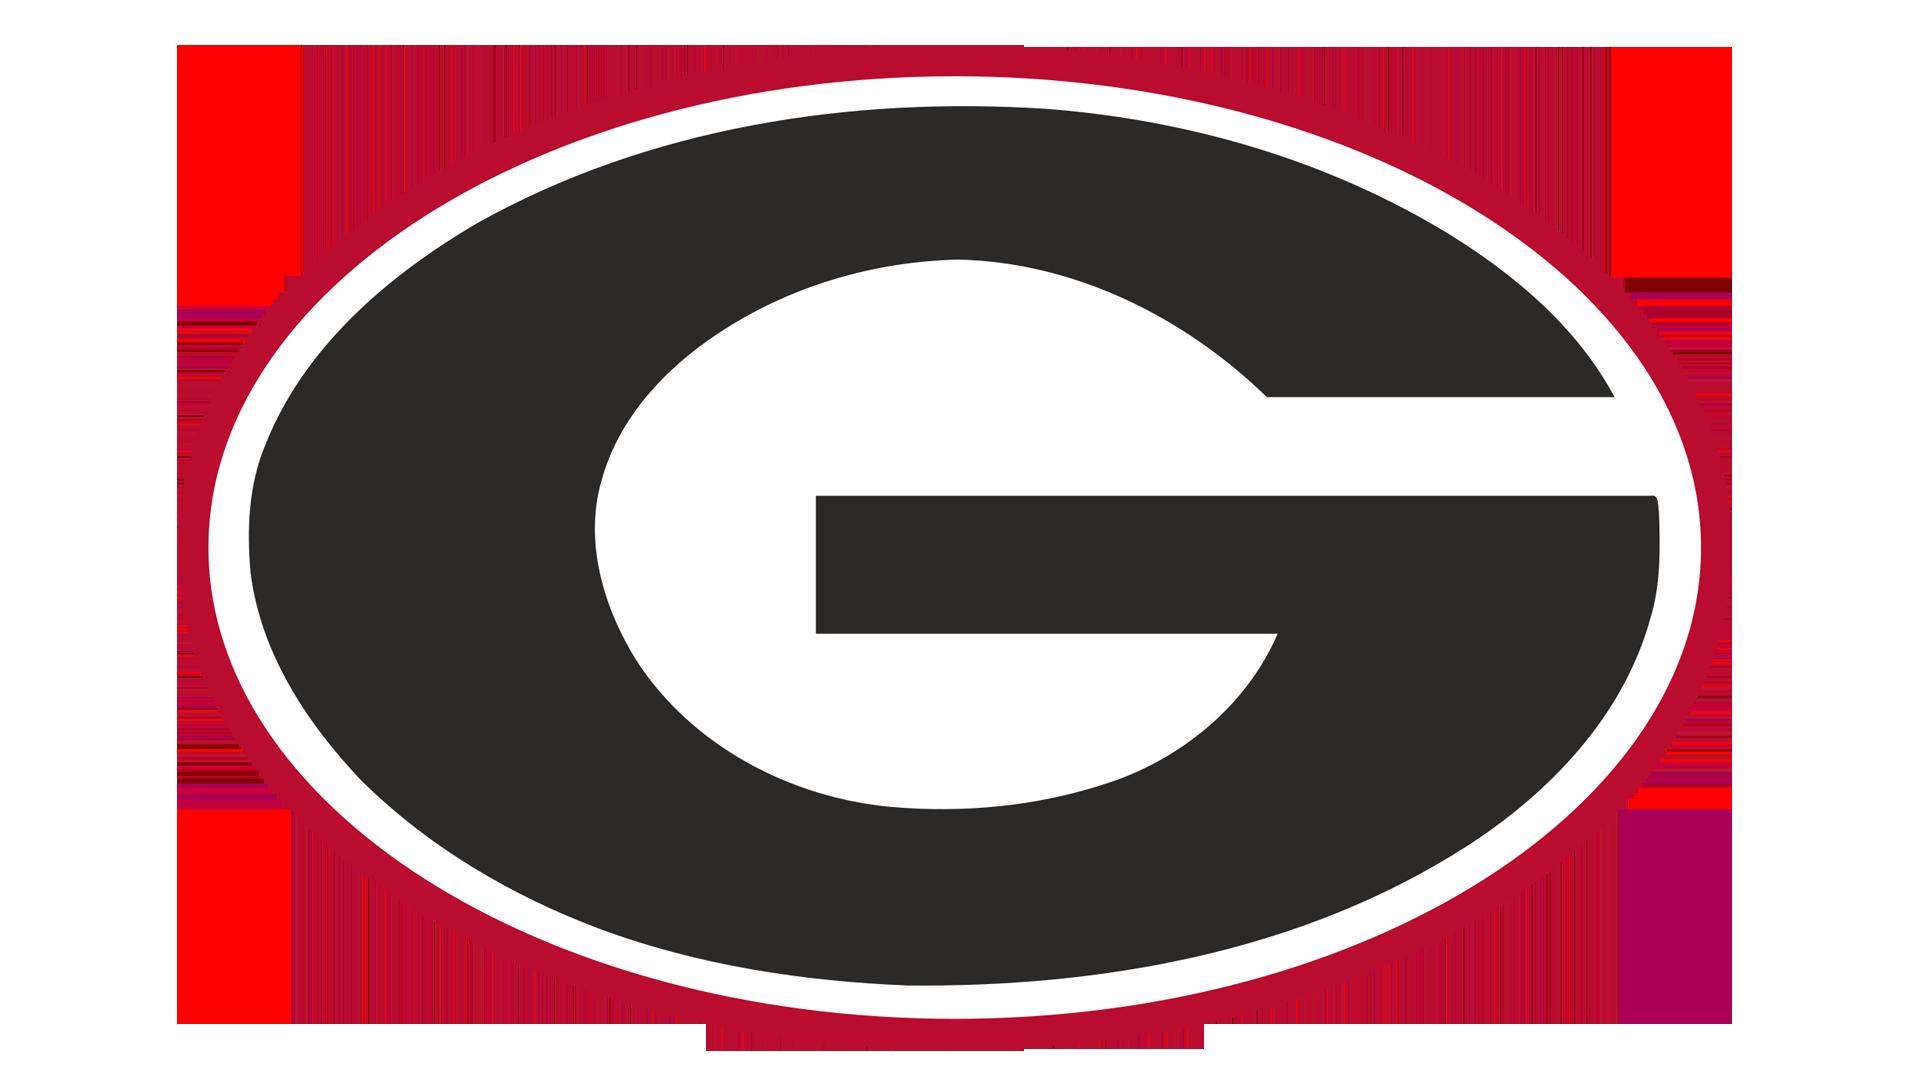 georgia bulldogs logo georgia bulldogs symbol meaning